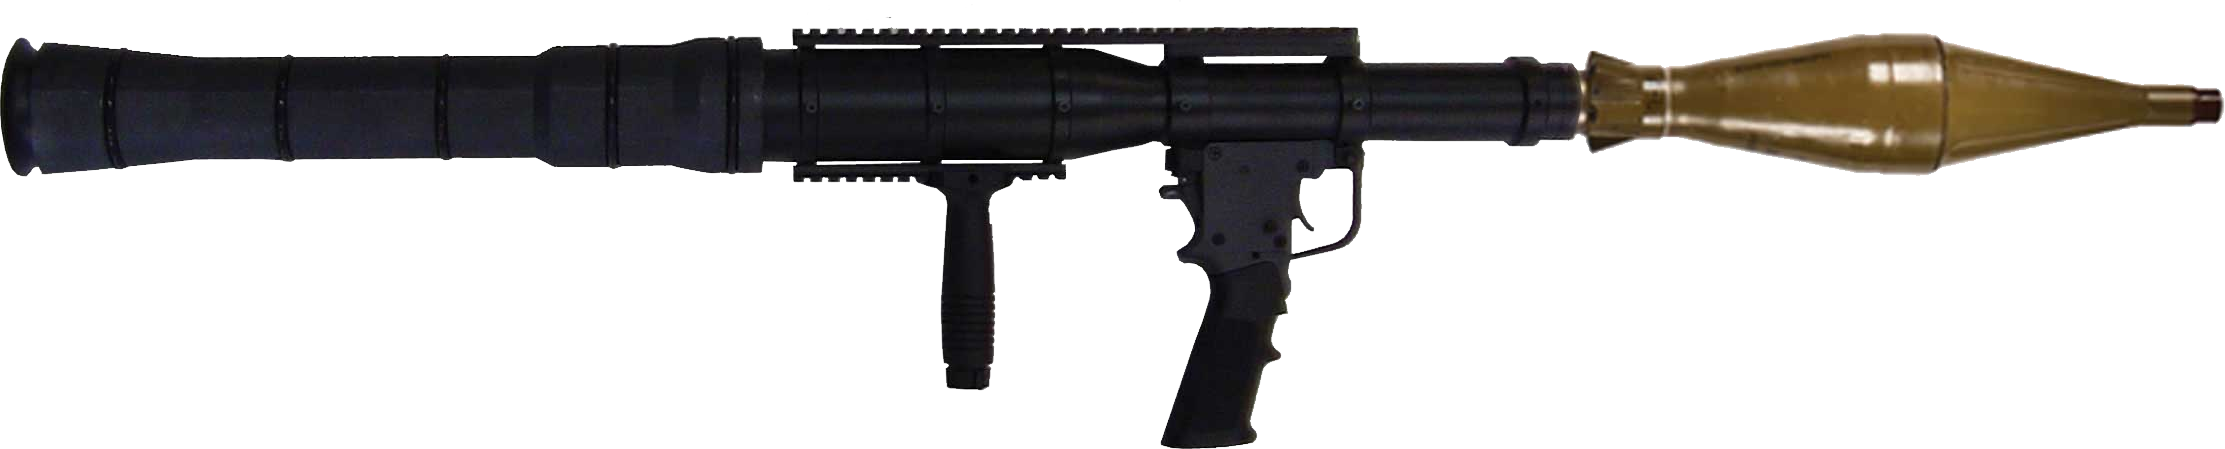 Rpg png images free. Guns clipart transparent background